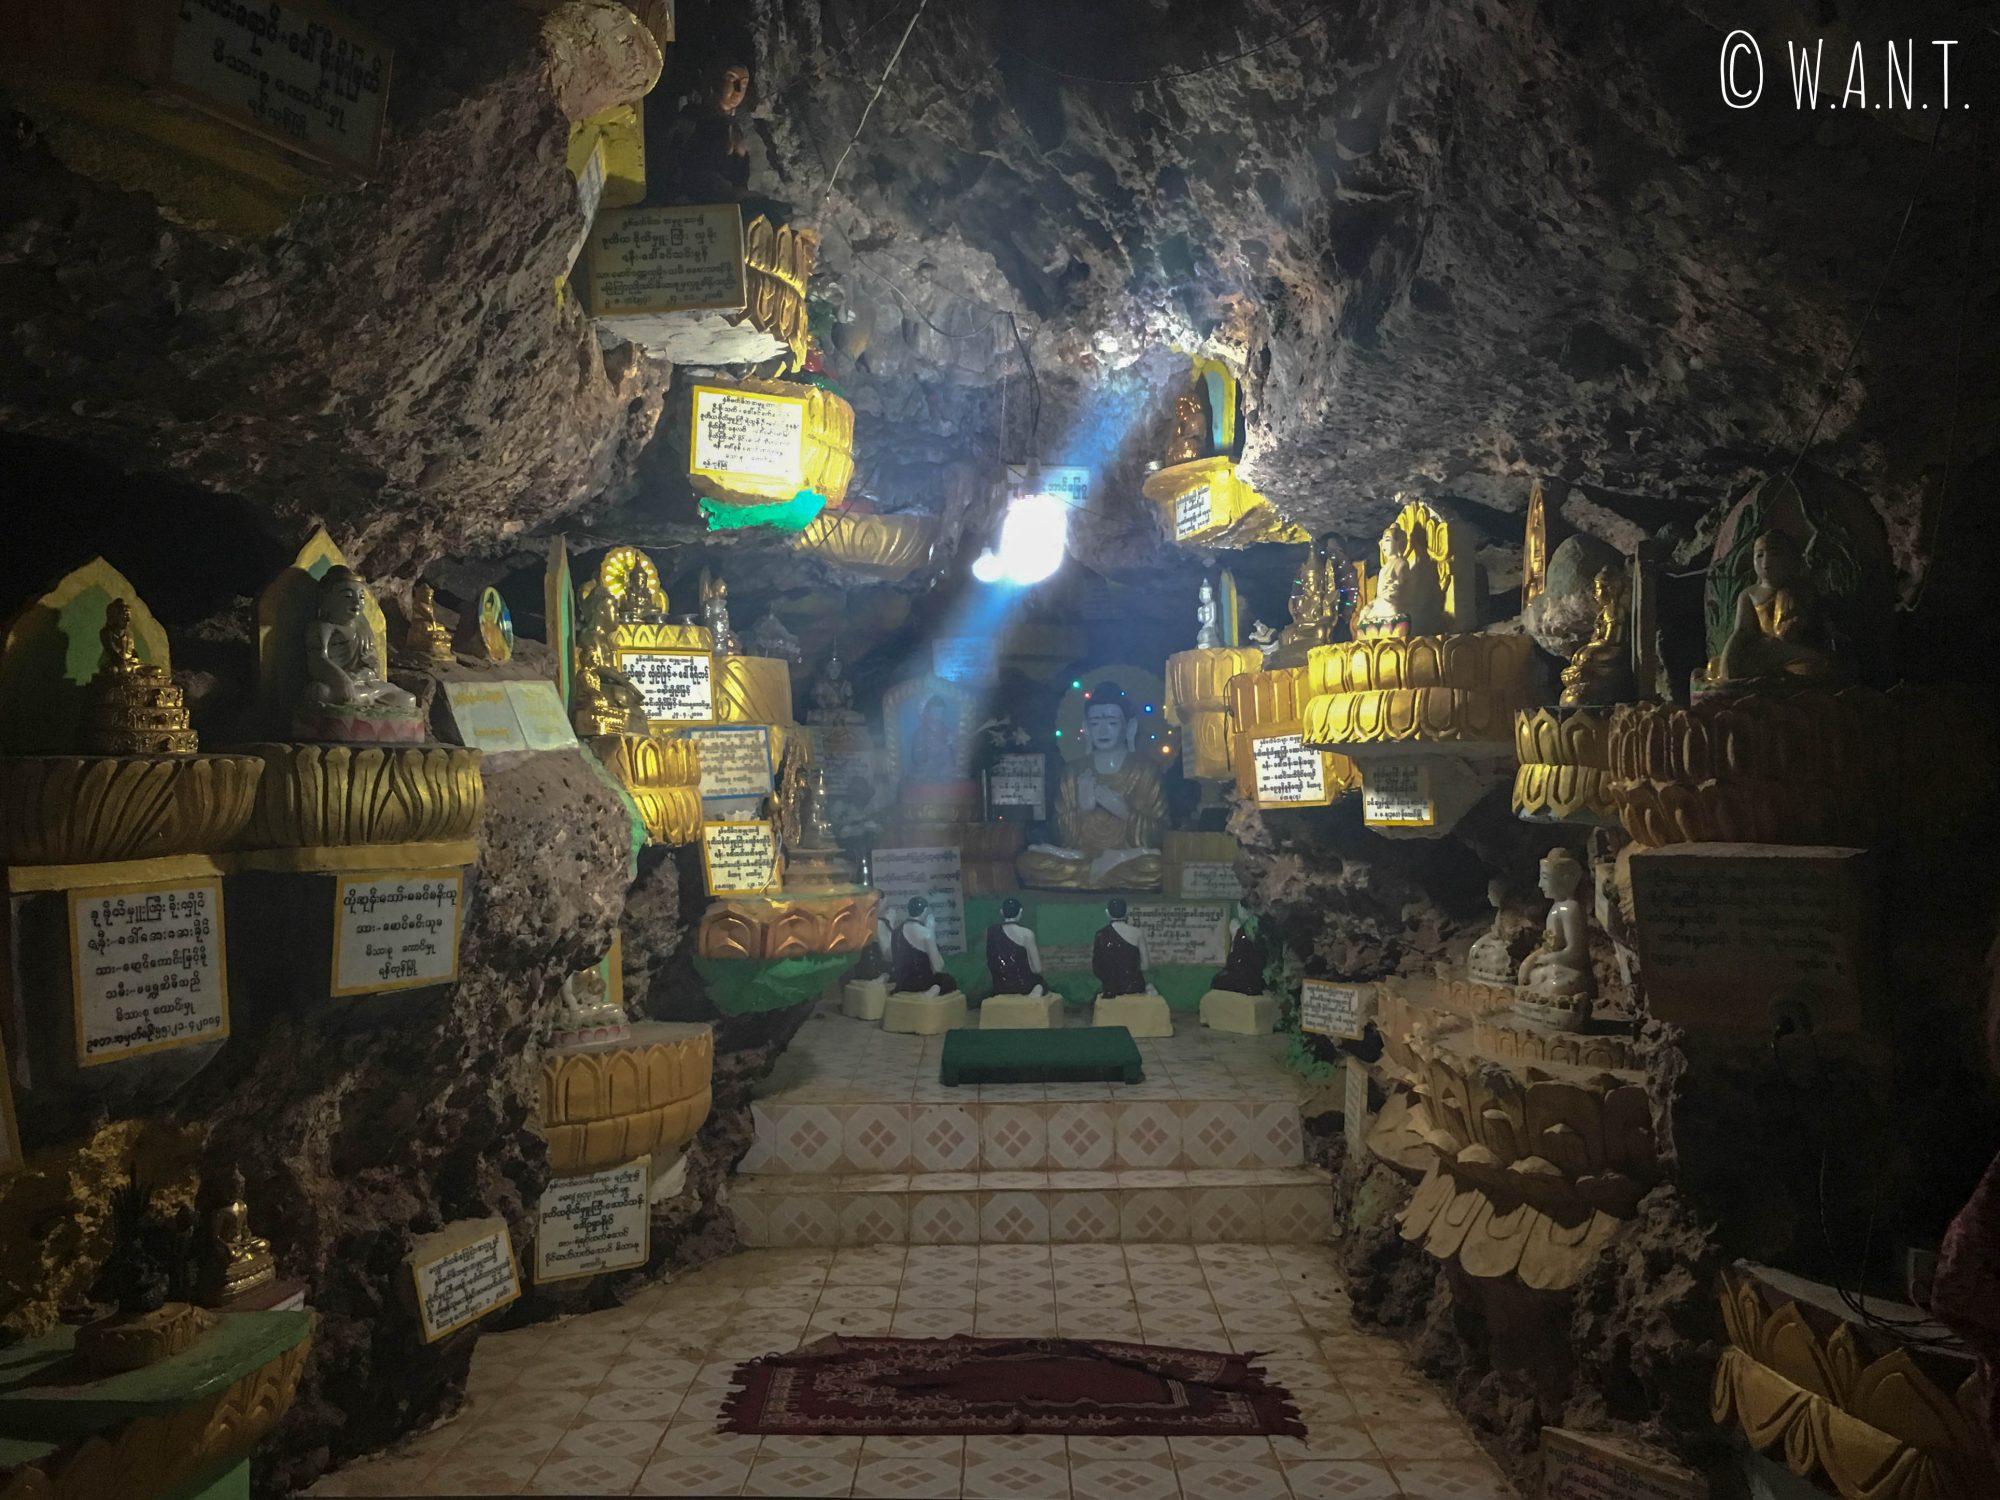 Echantillons de statues de Bouddha dans la grotte de la pagode Shwe oo min